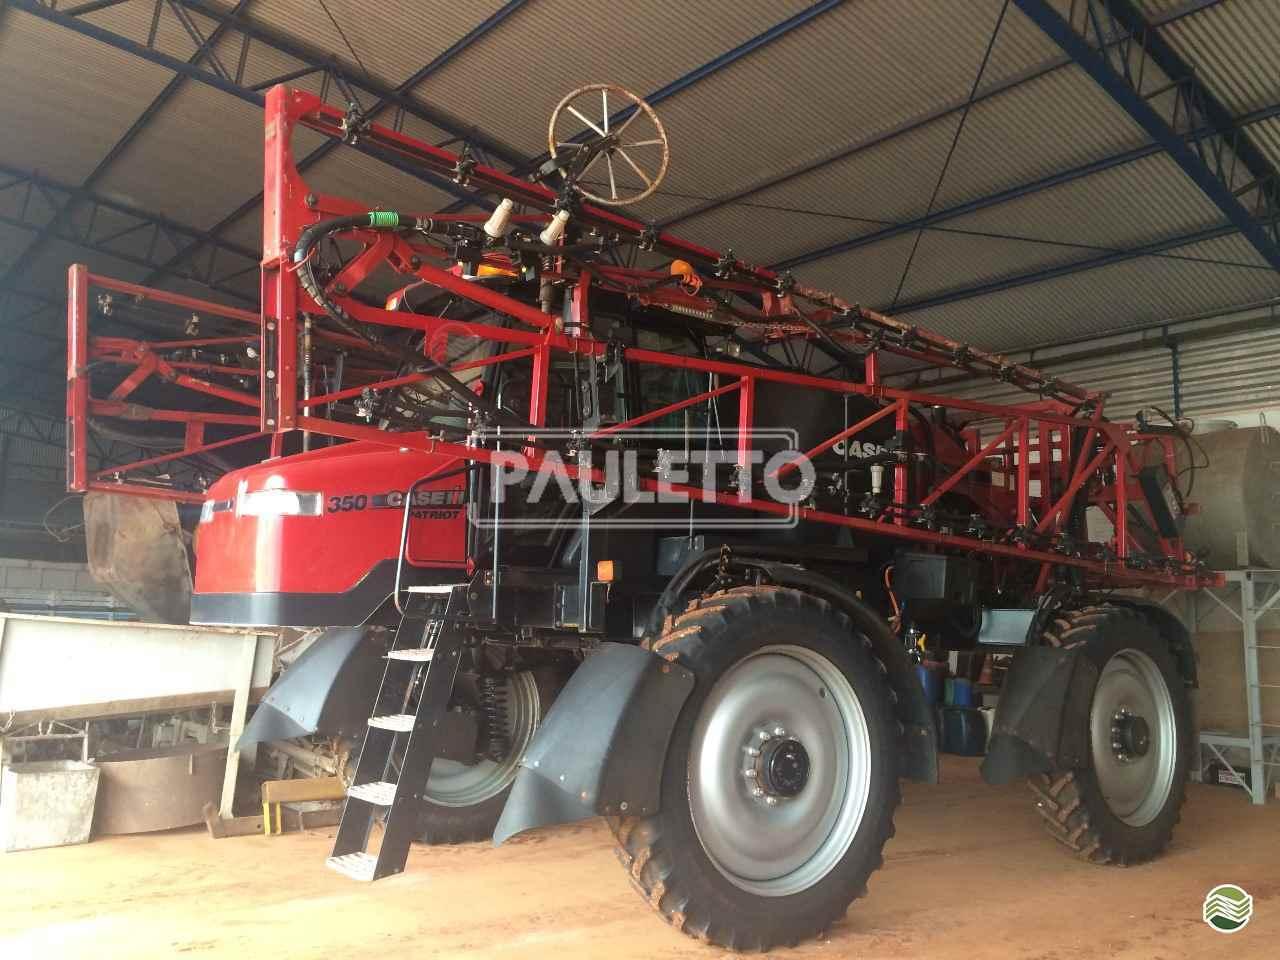 PATRIOT 350 de Metalúrgica Pauletto - CASCAVEL/PR